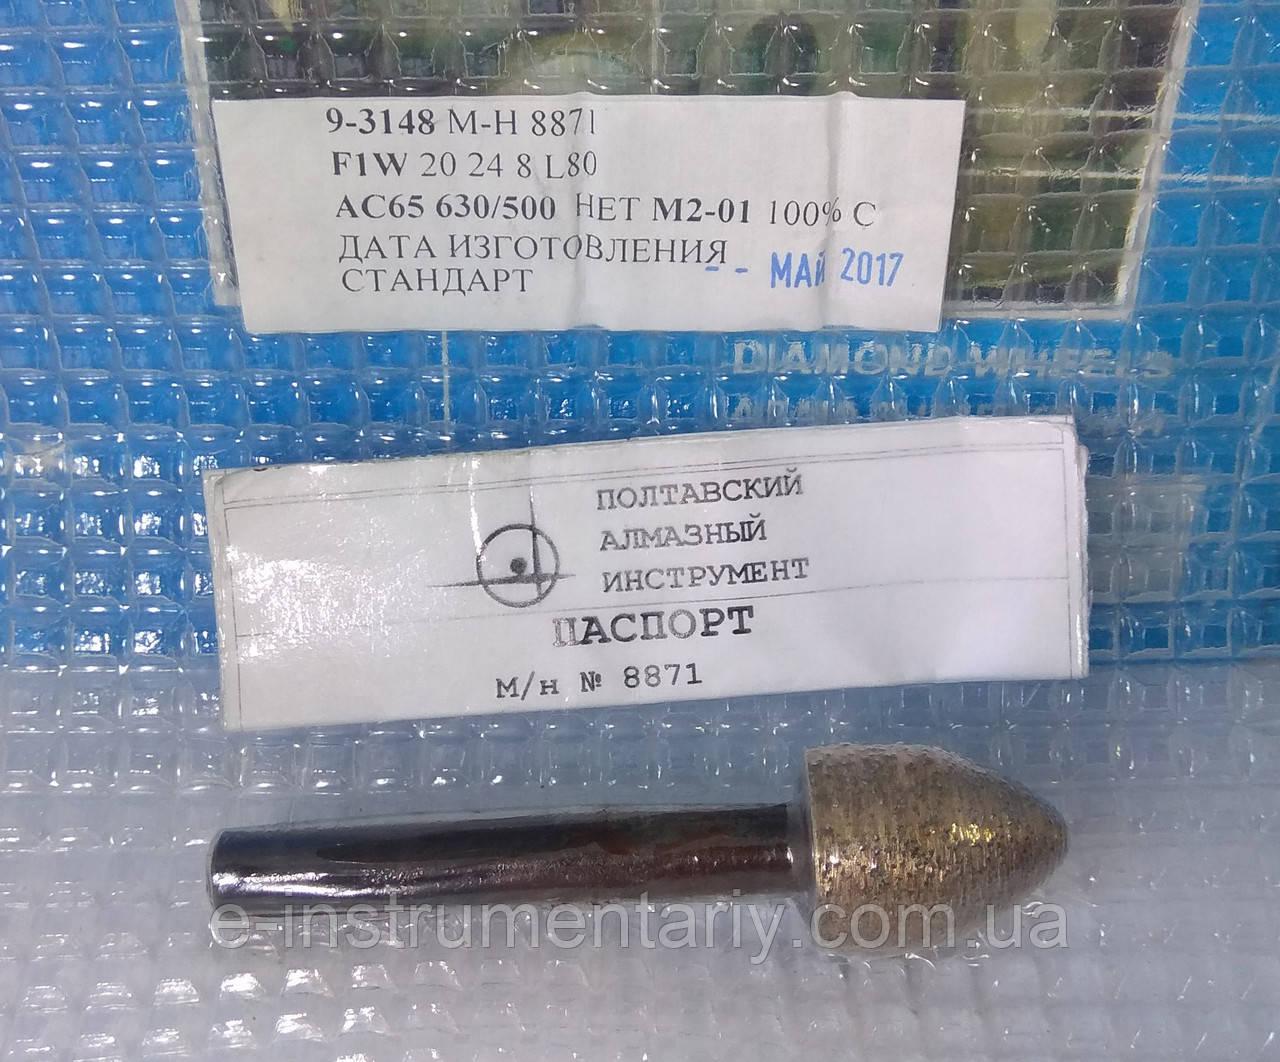 Головка алмазная 20х24х8 L80 сводчатая со спеченным алмазным слоем